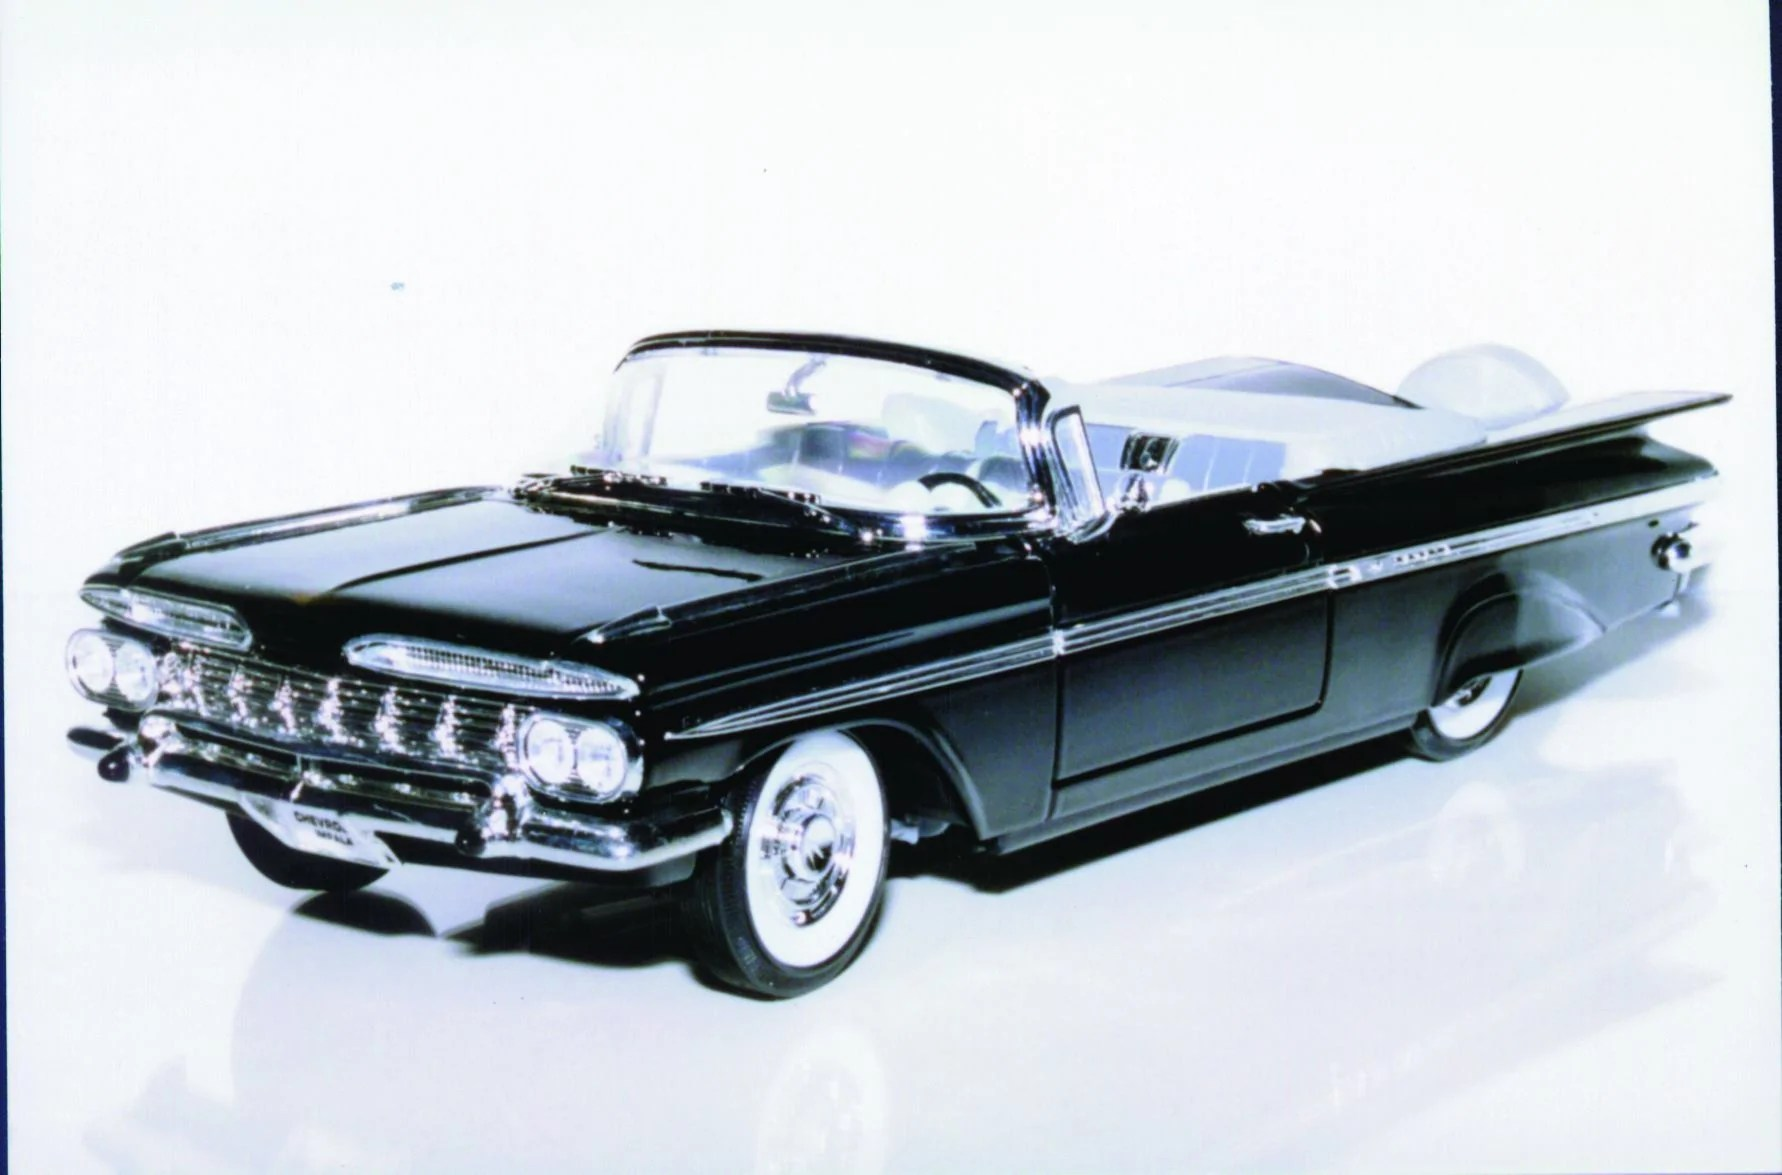 medium resolution of 1 18 yatming chevy impala 59 convertible